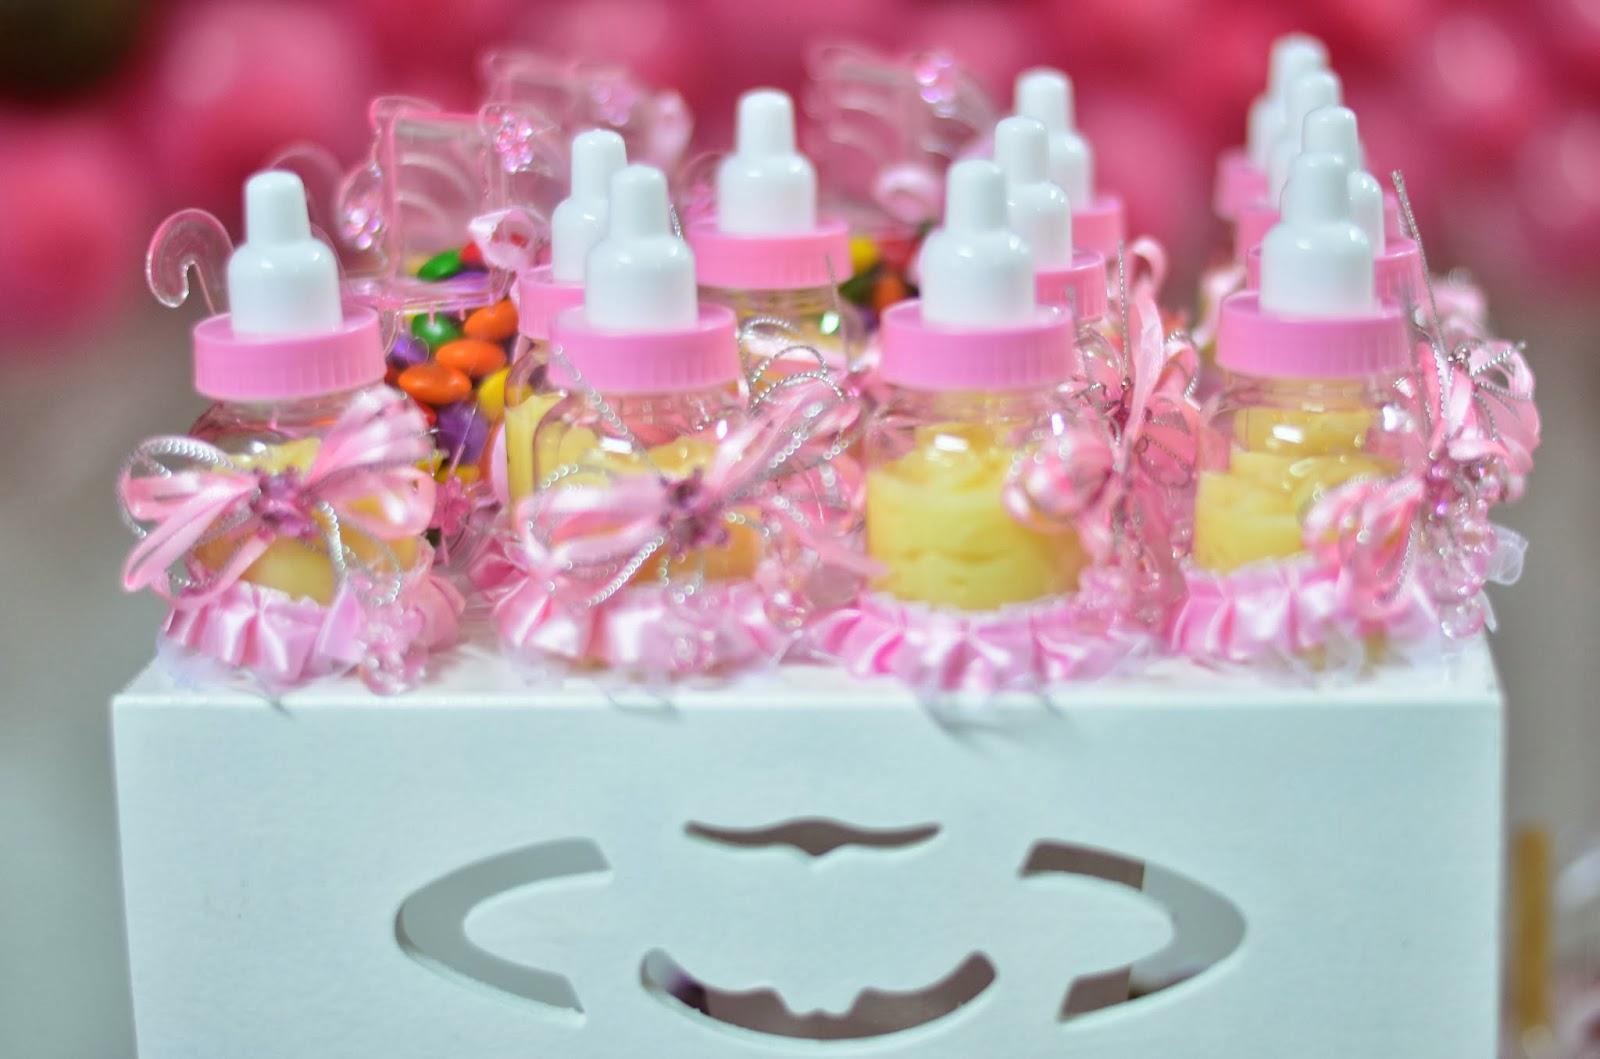 Baby chá da Gi_Eliane Sopran